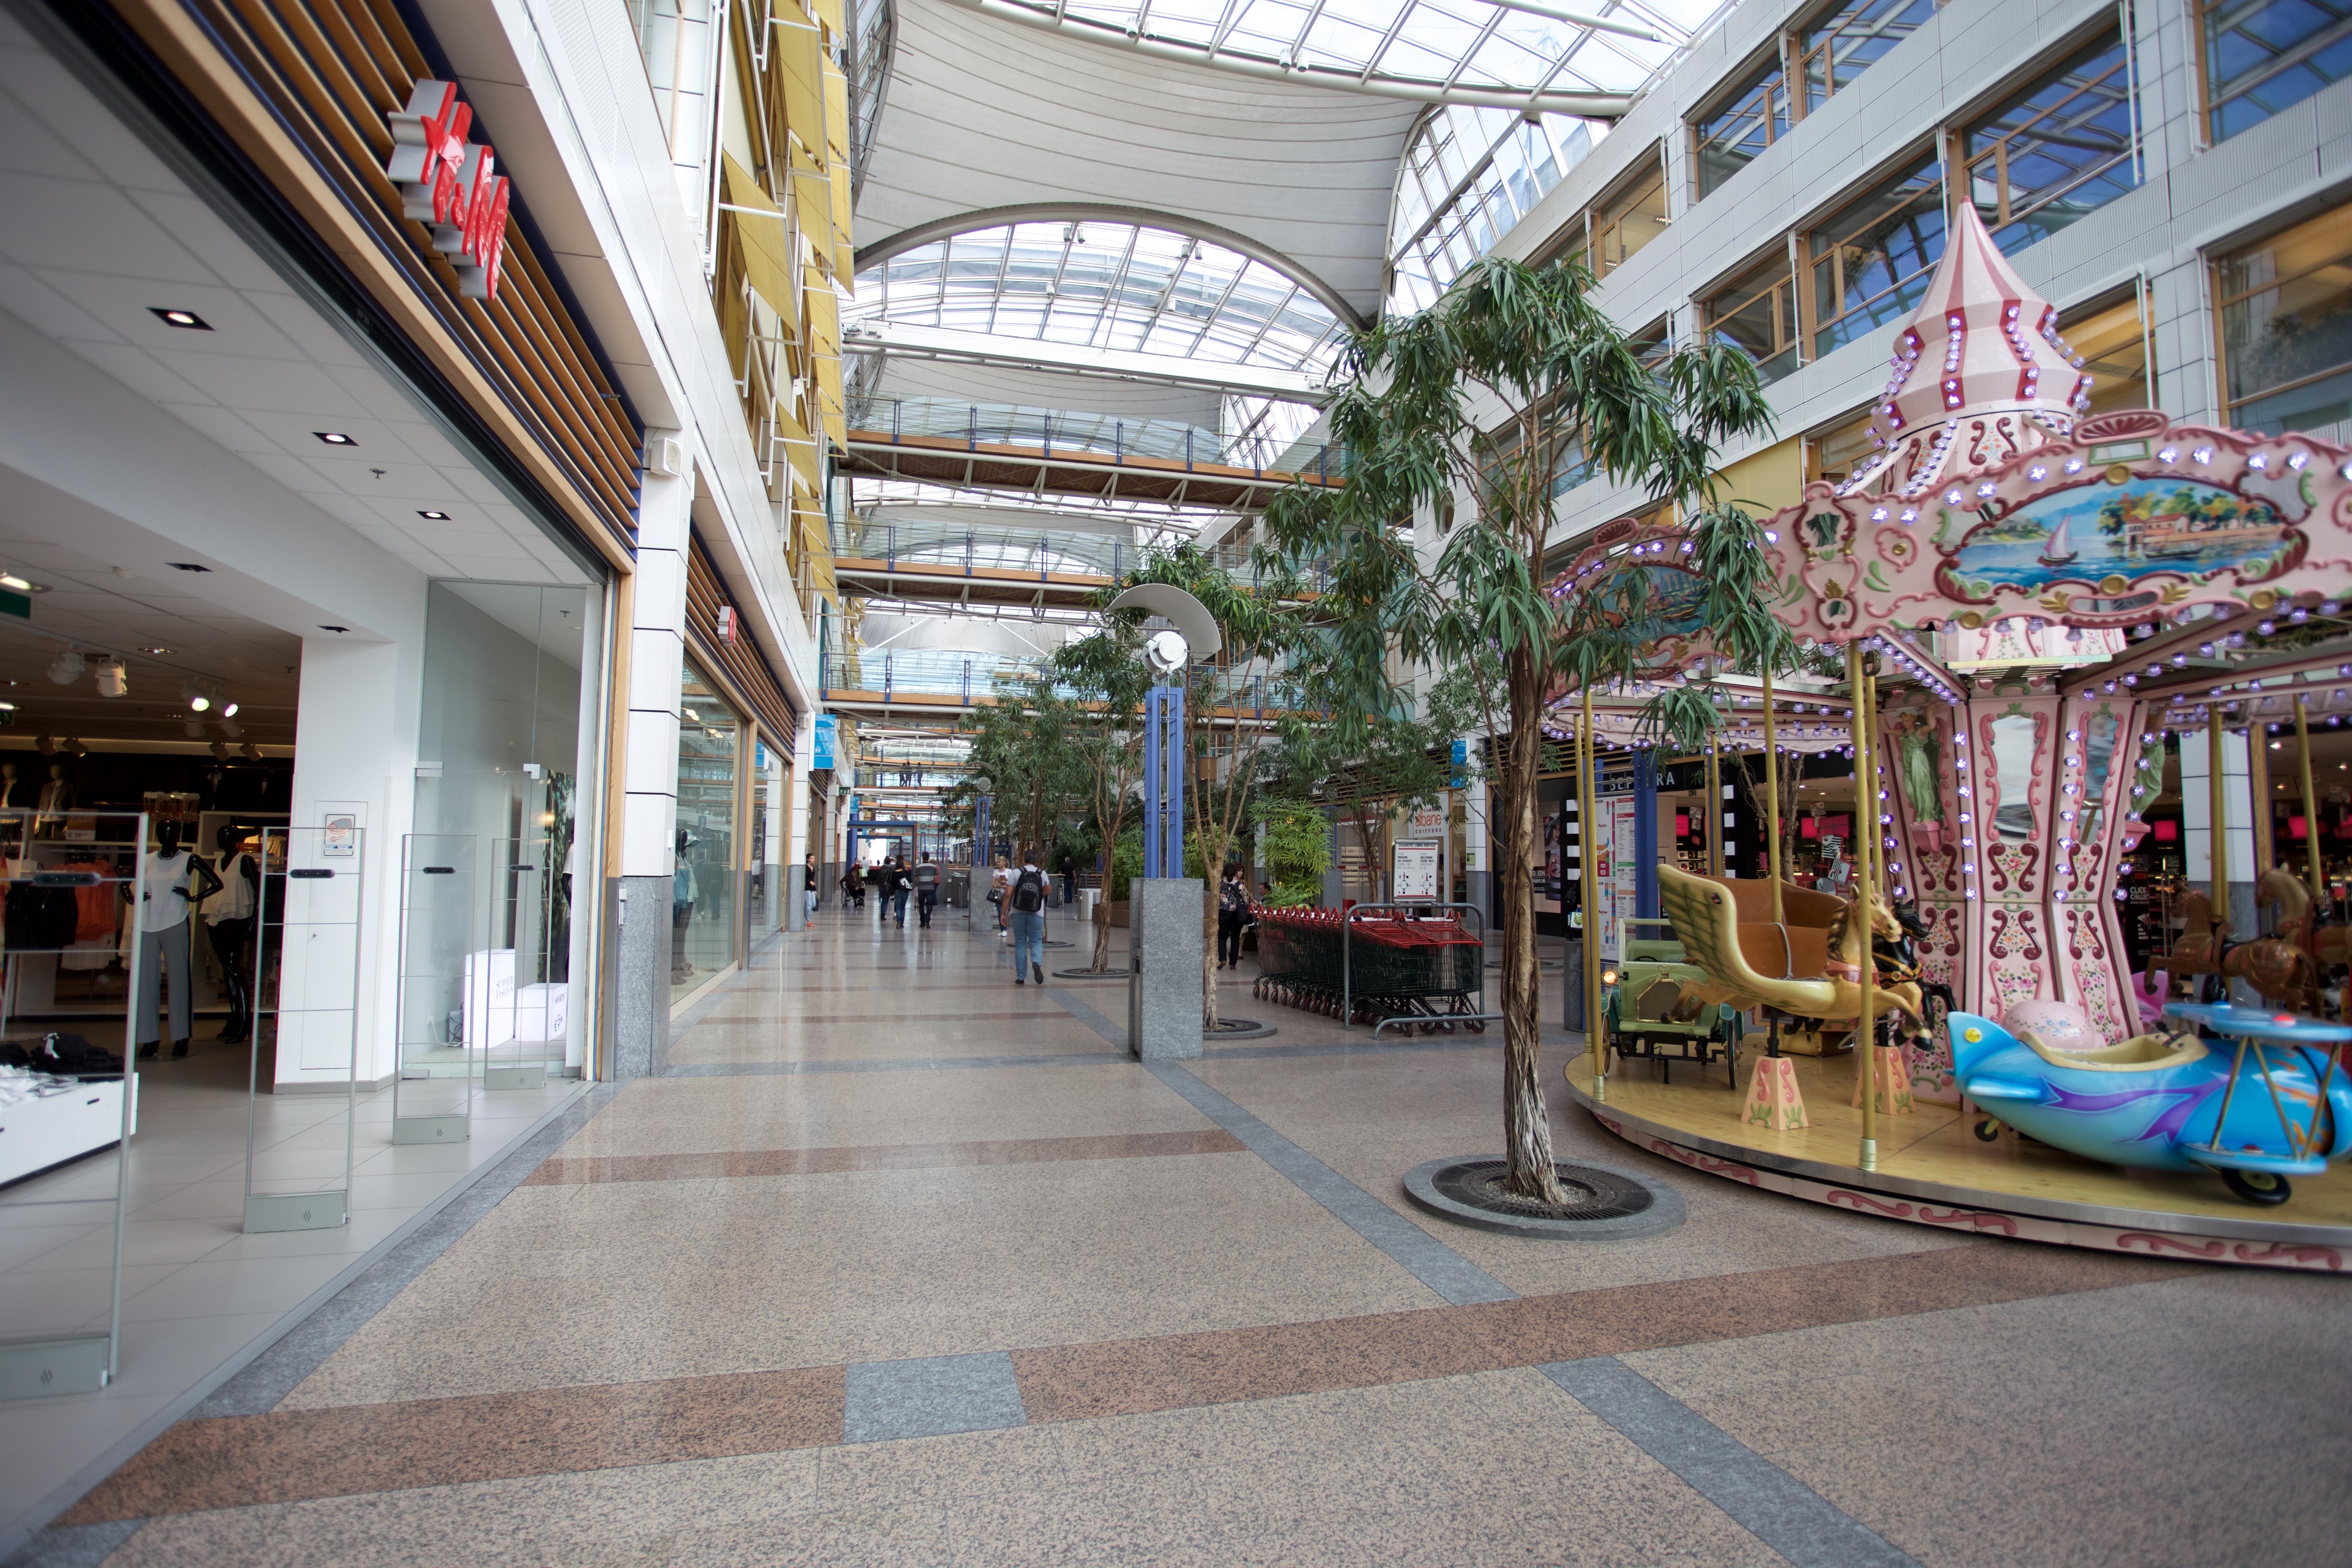 An image of the Auchan Kirchberg Mall